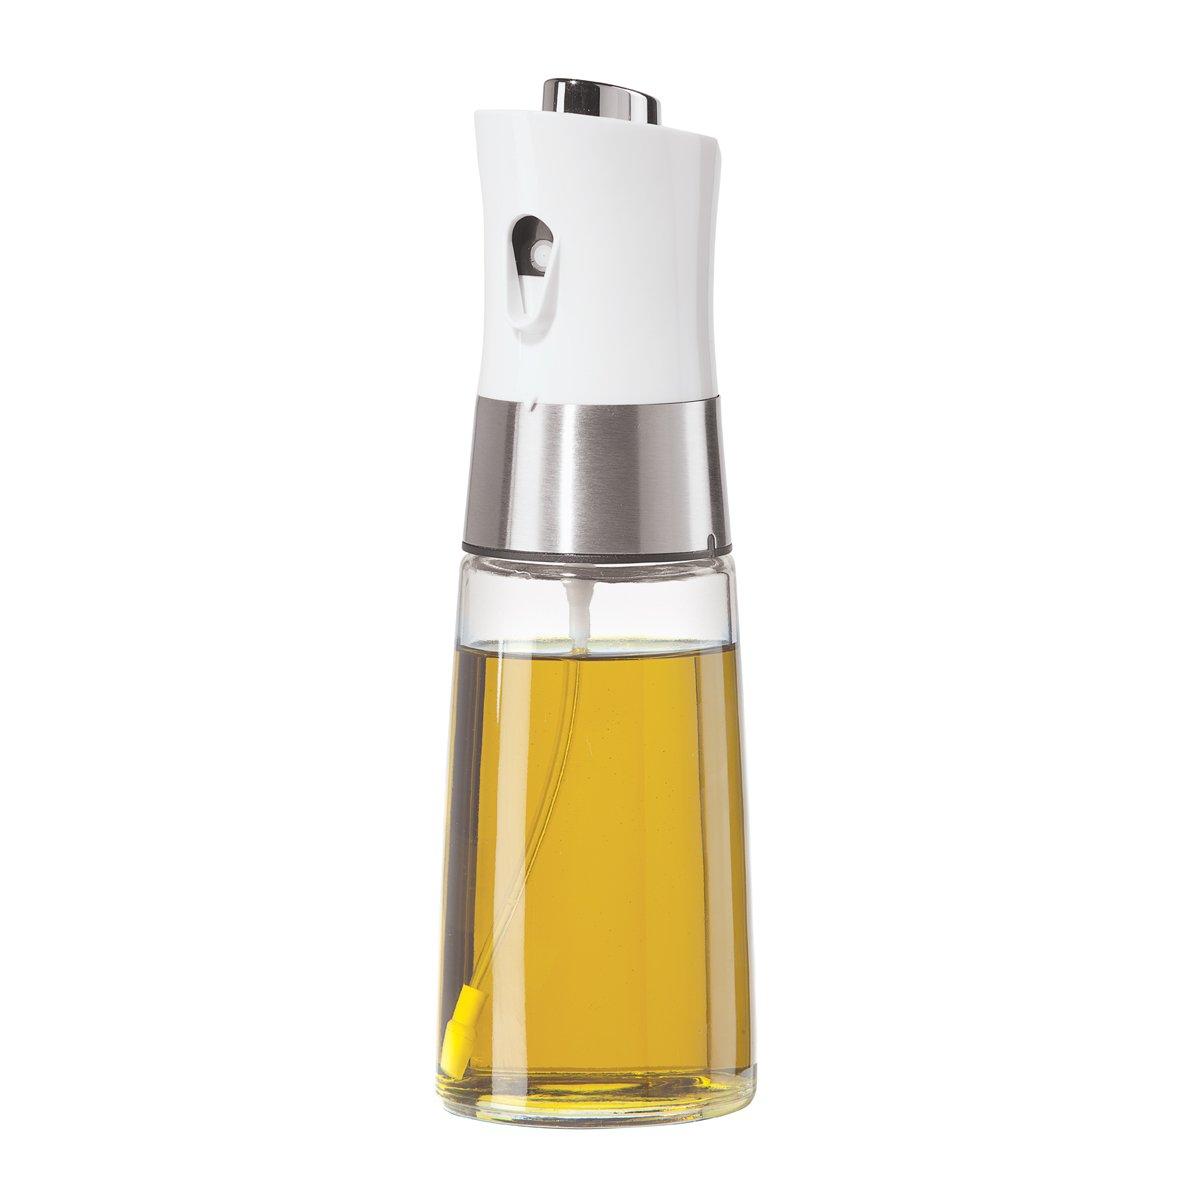 Amazon.com: Oggi 6021 Spray and Pour Oil Dispenser Bottle: Kitchen ...